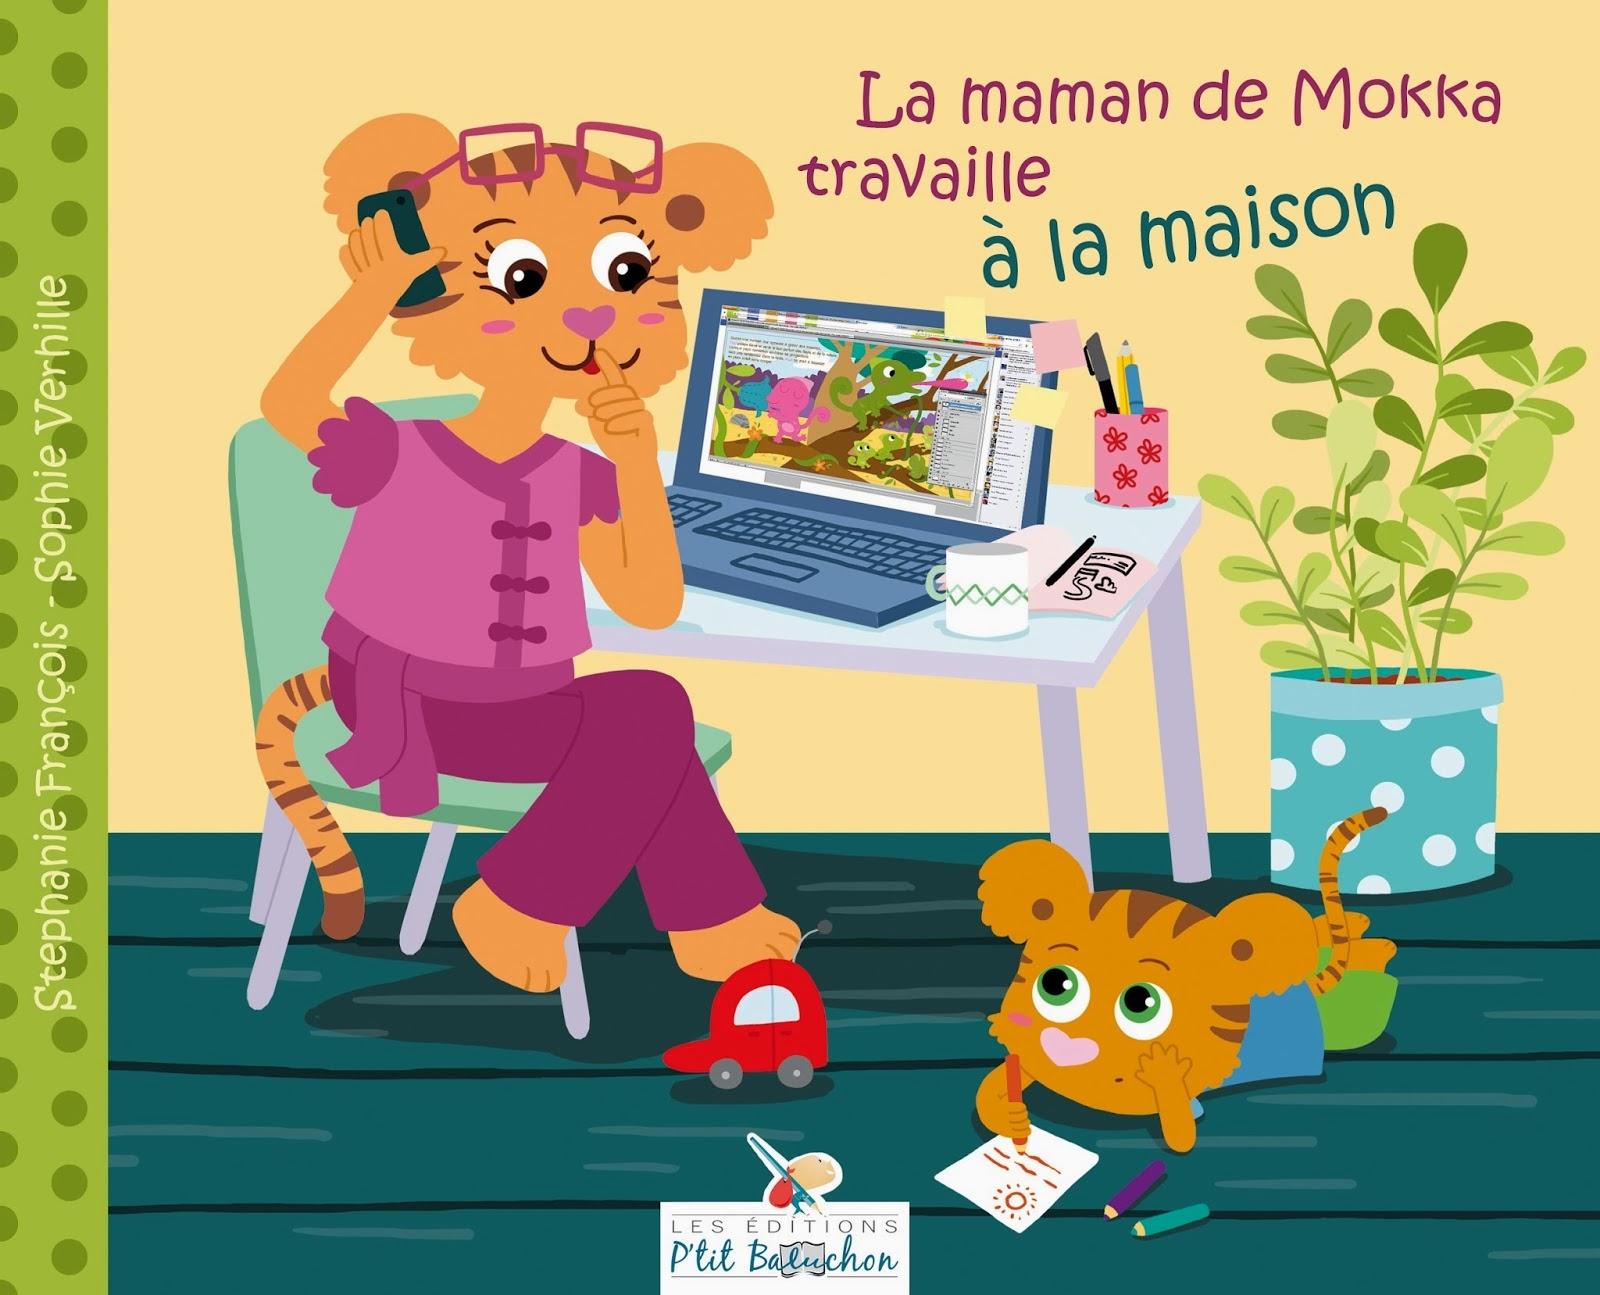 http://www.editionsptitbaluchon.com/#!la-maman-de-mokka-travaille-a-/cbki